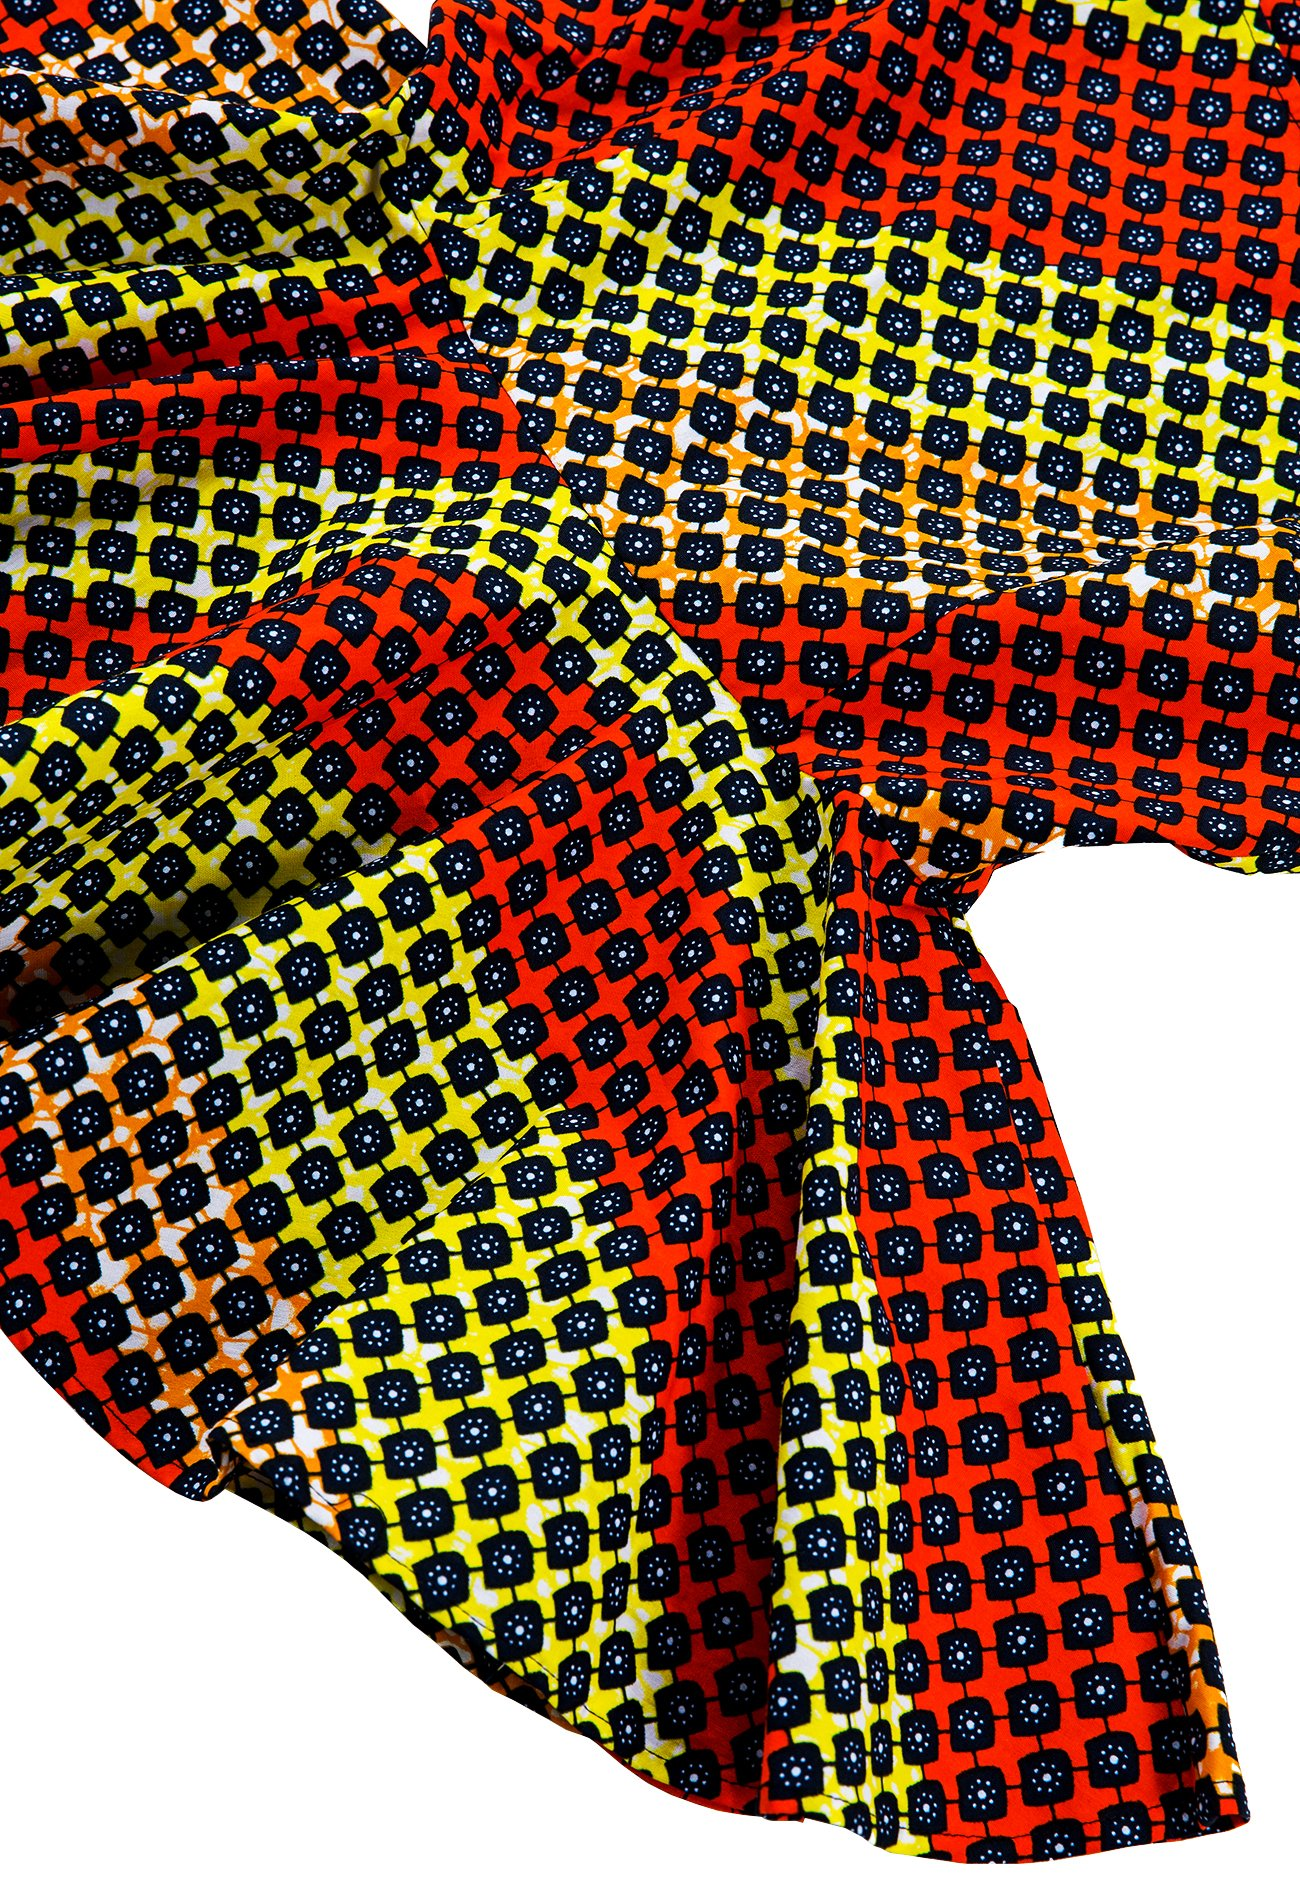 Shenbolen Womens Dashiki Tops Sleeveless Summer African Printed Slim Fit Shirts Blouse (Medium,B) by Shenbolen (Image #4)